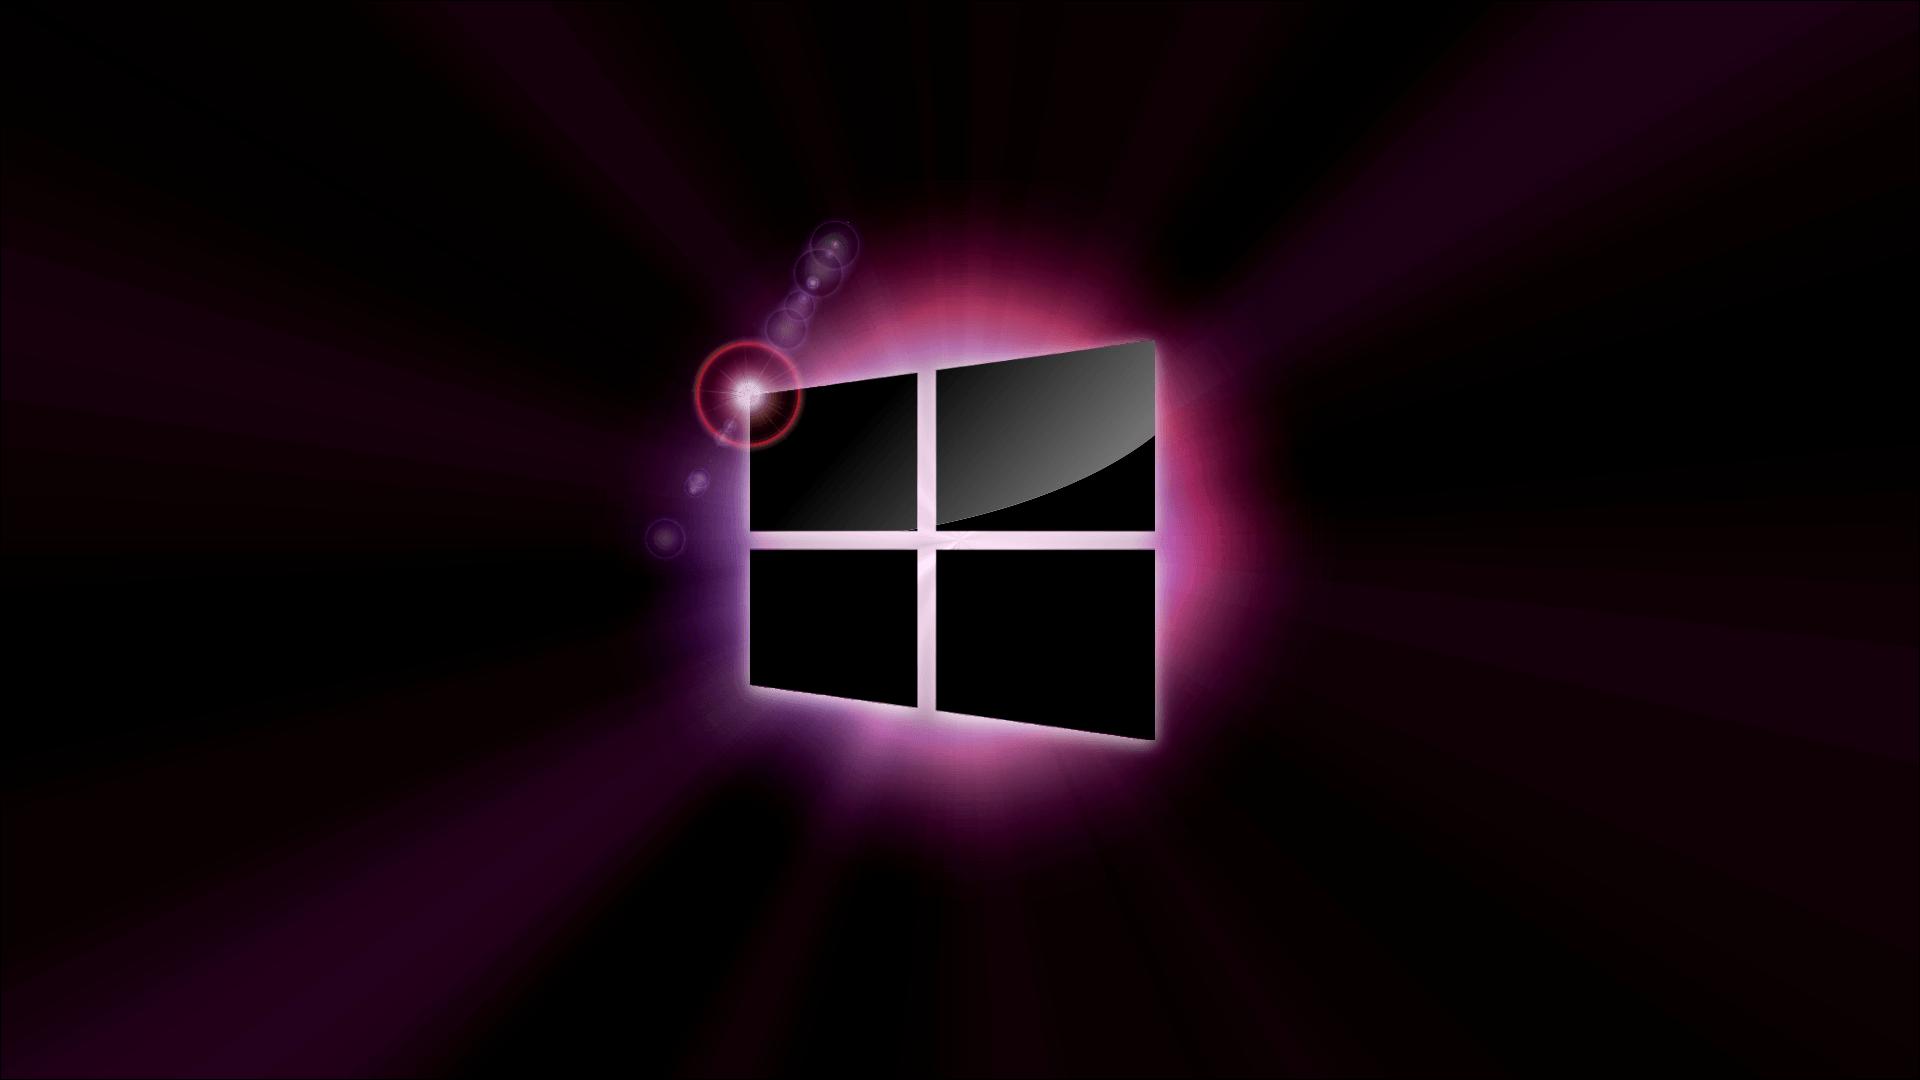 logo windows 8 black - photo #16